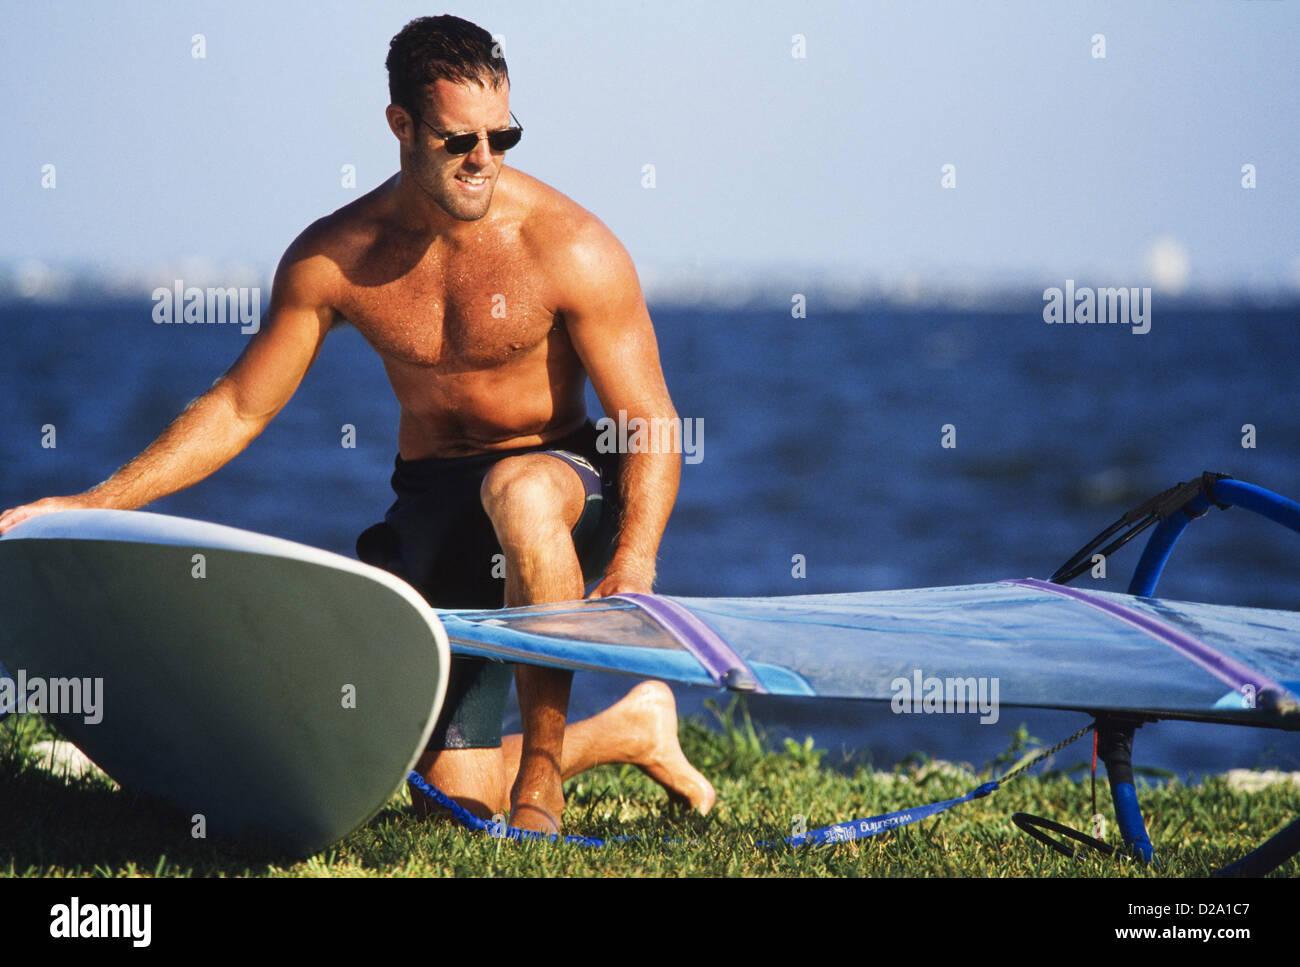 Männliche Sportler Windsurfen, Miami MR328 Stockbild